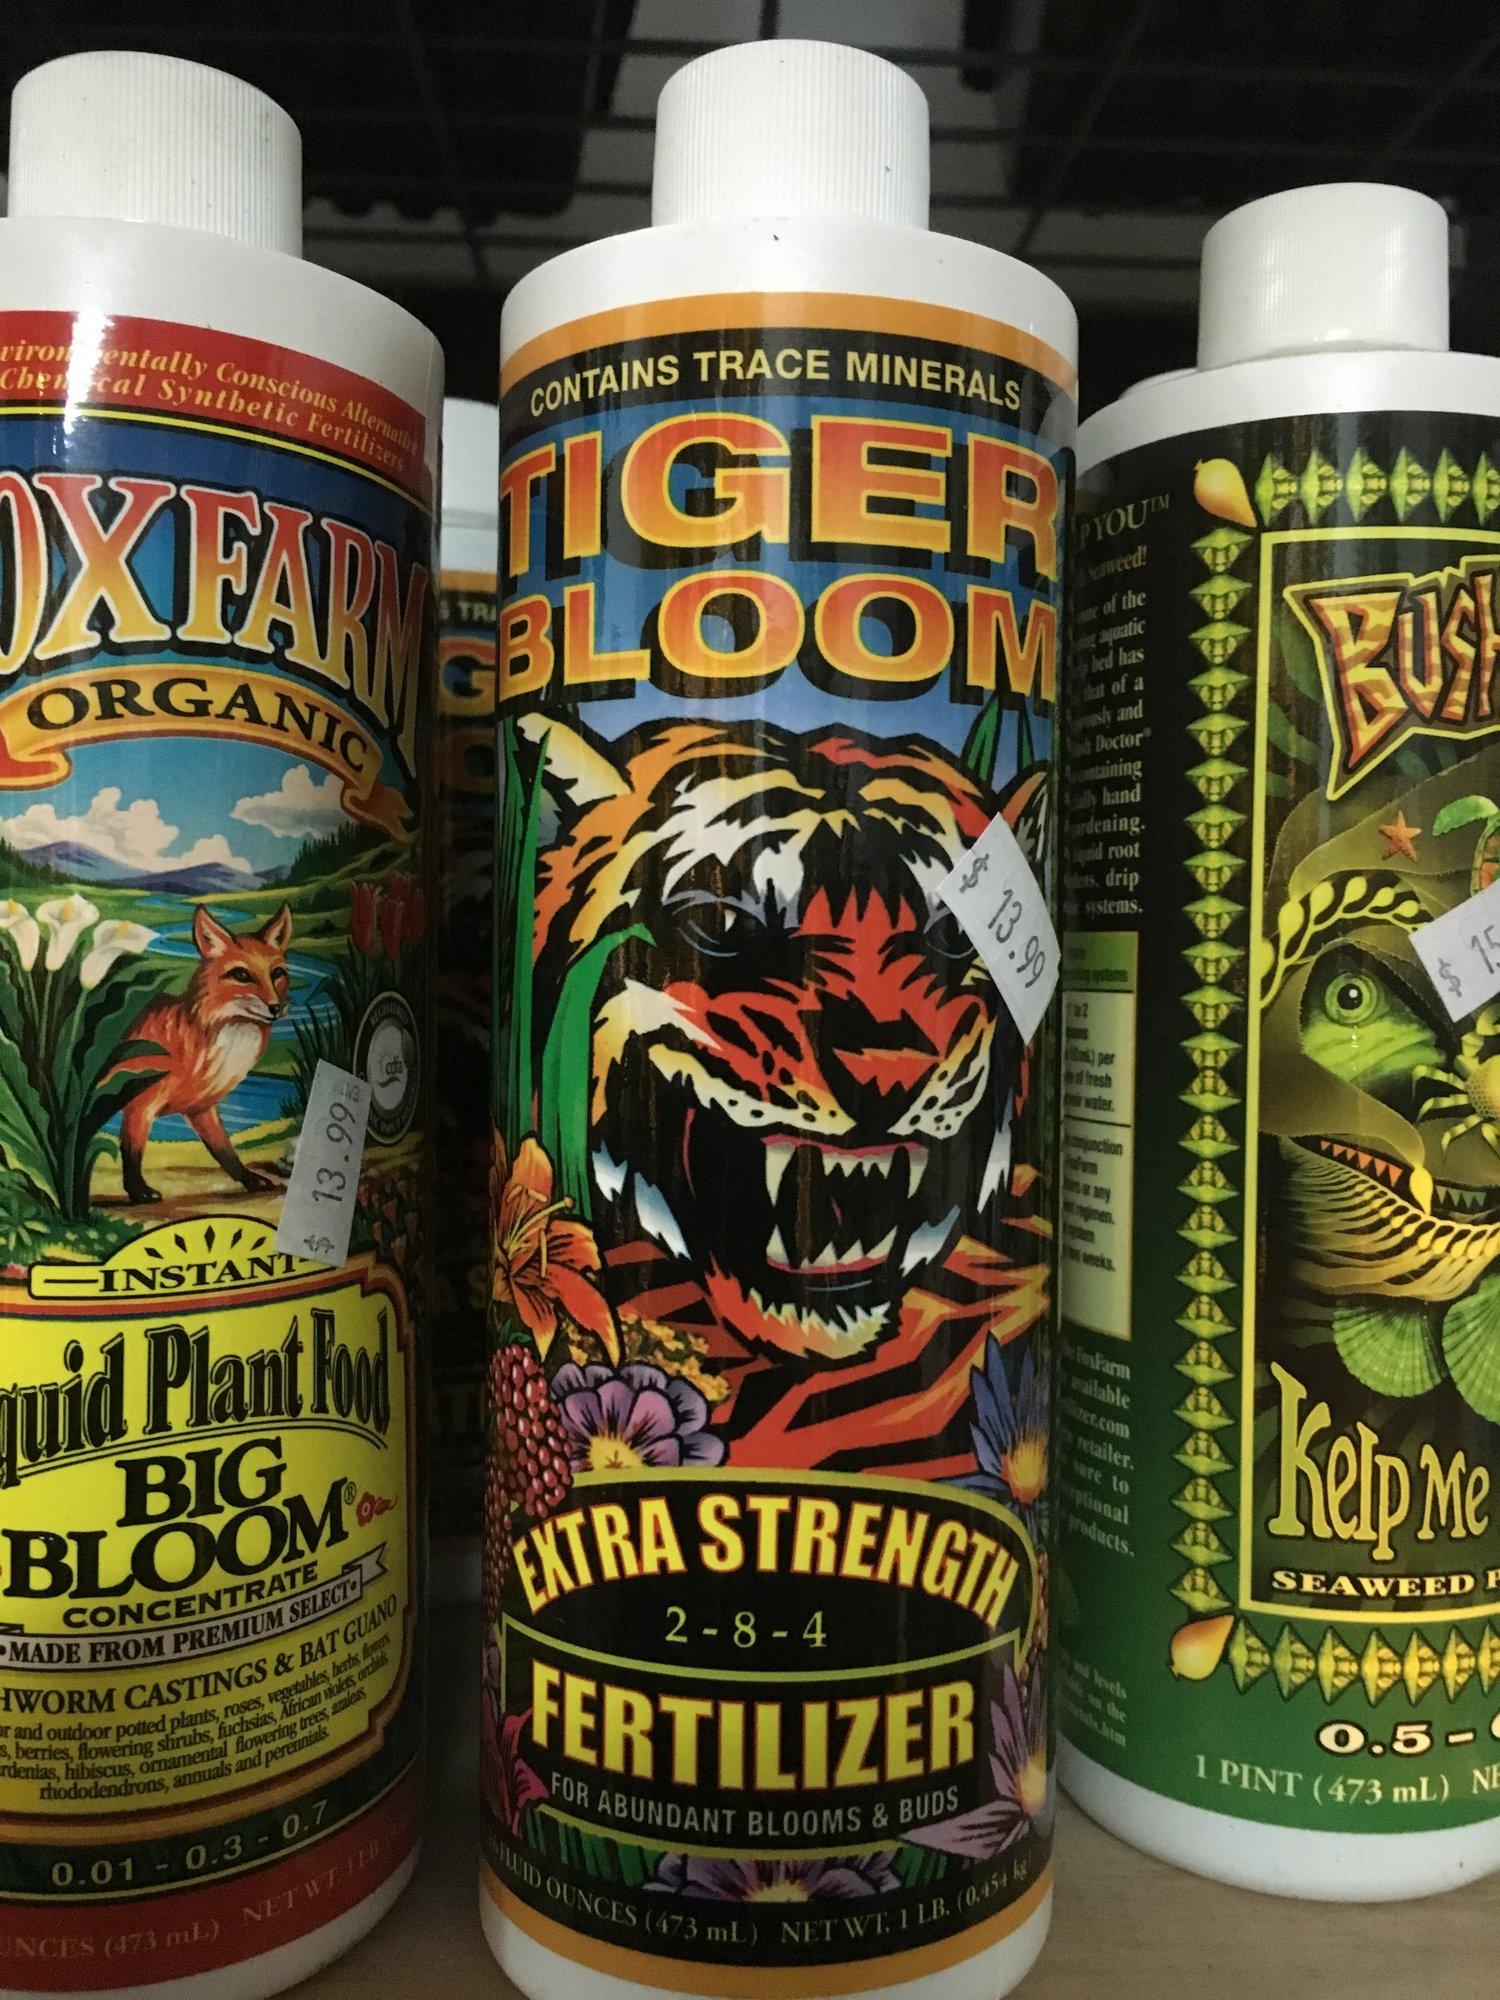 FOXFARM TIGER BLOOM FERTILIZER 1 PINT Vicious Bloomer with Micronutrients (  2 - 8 - 4 ) — Natty Garden